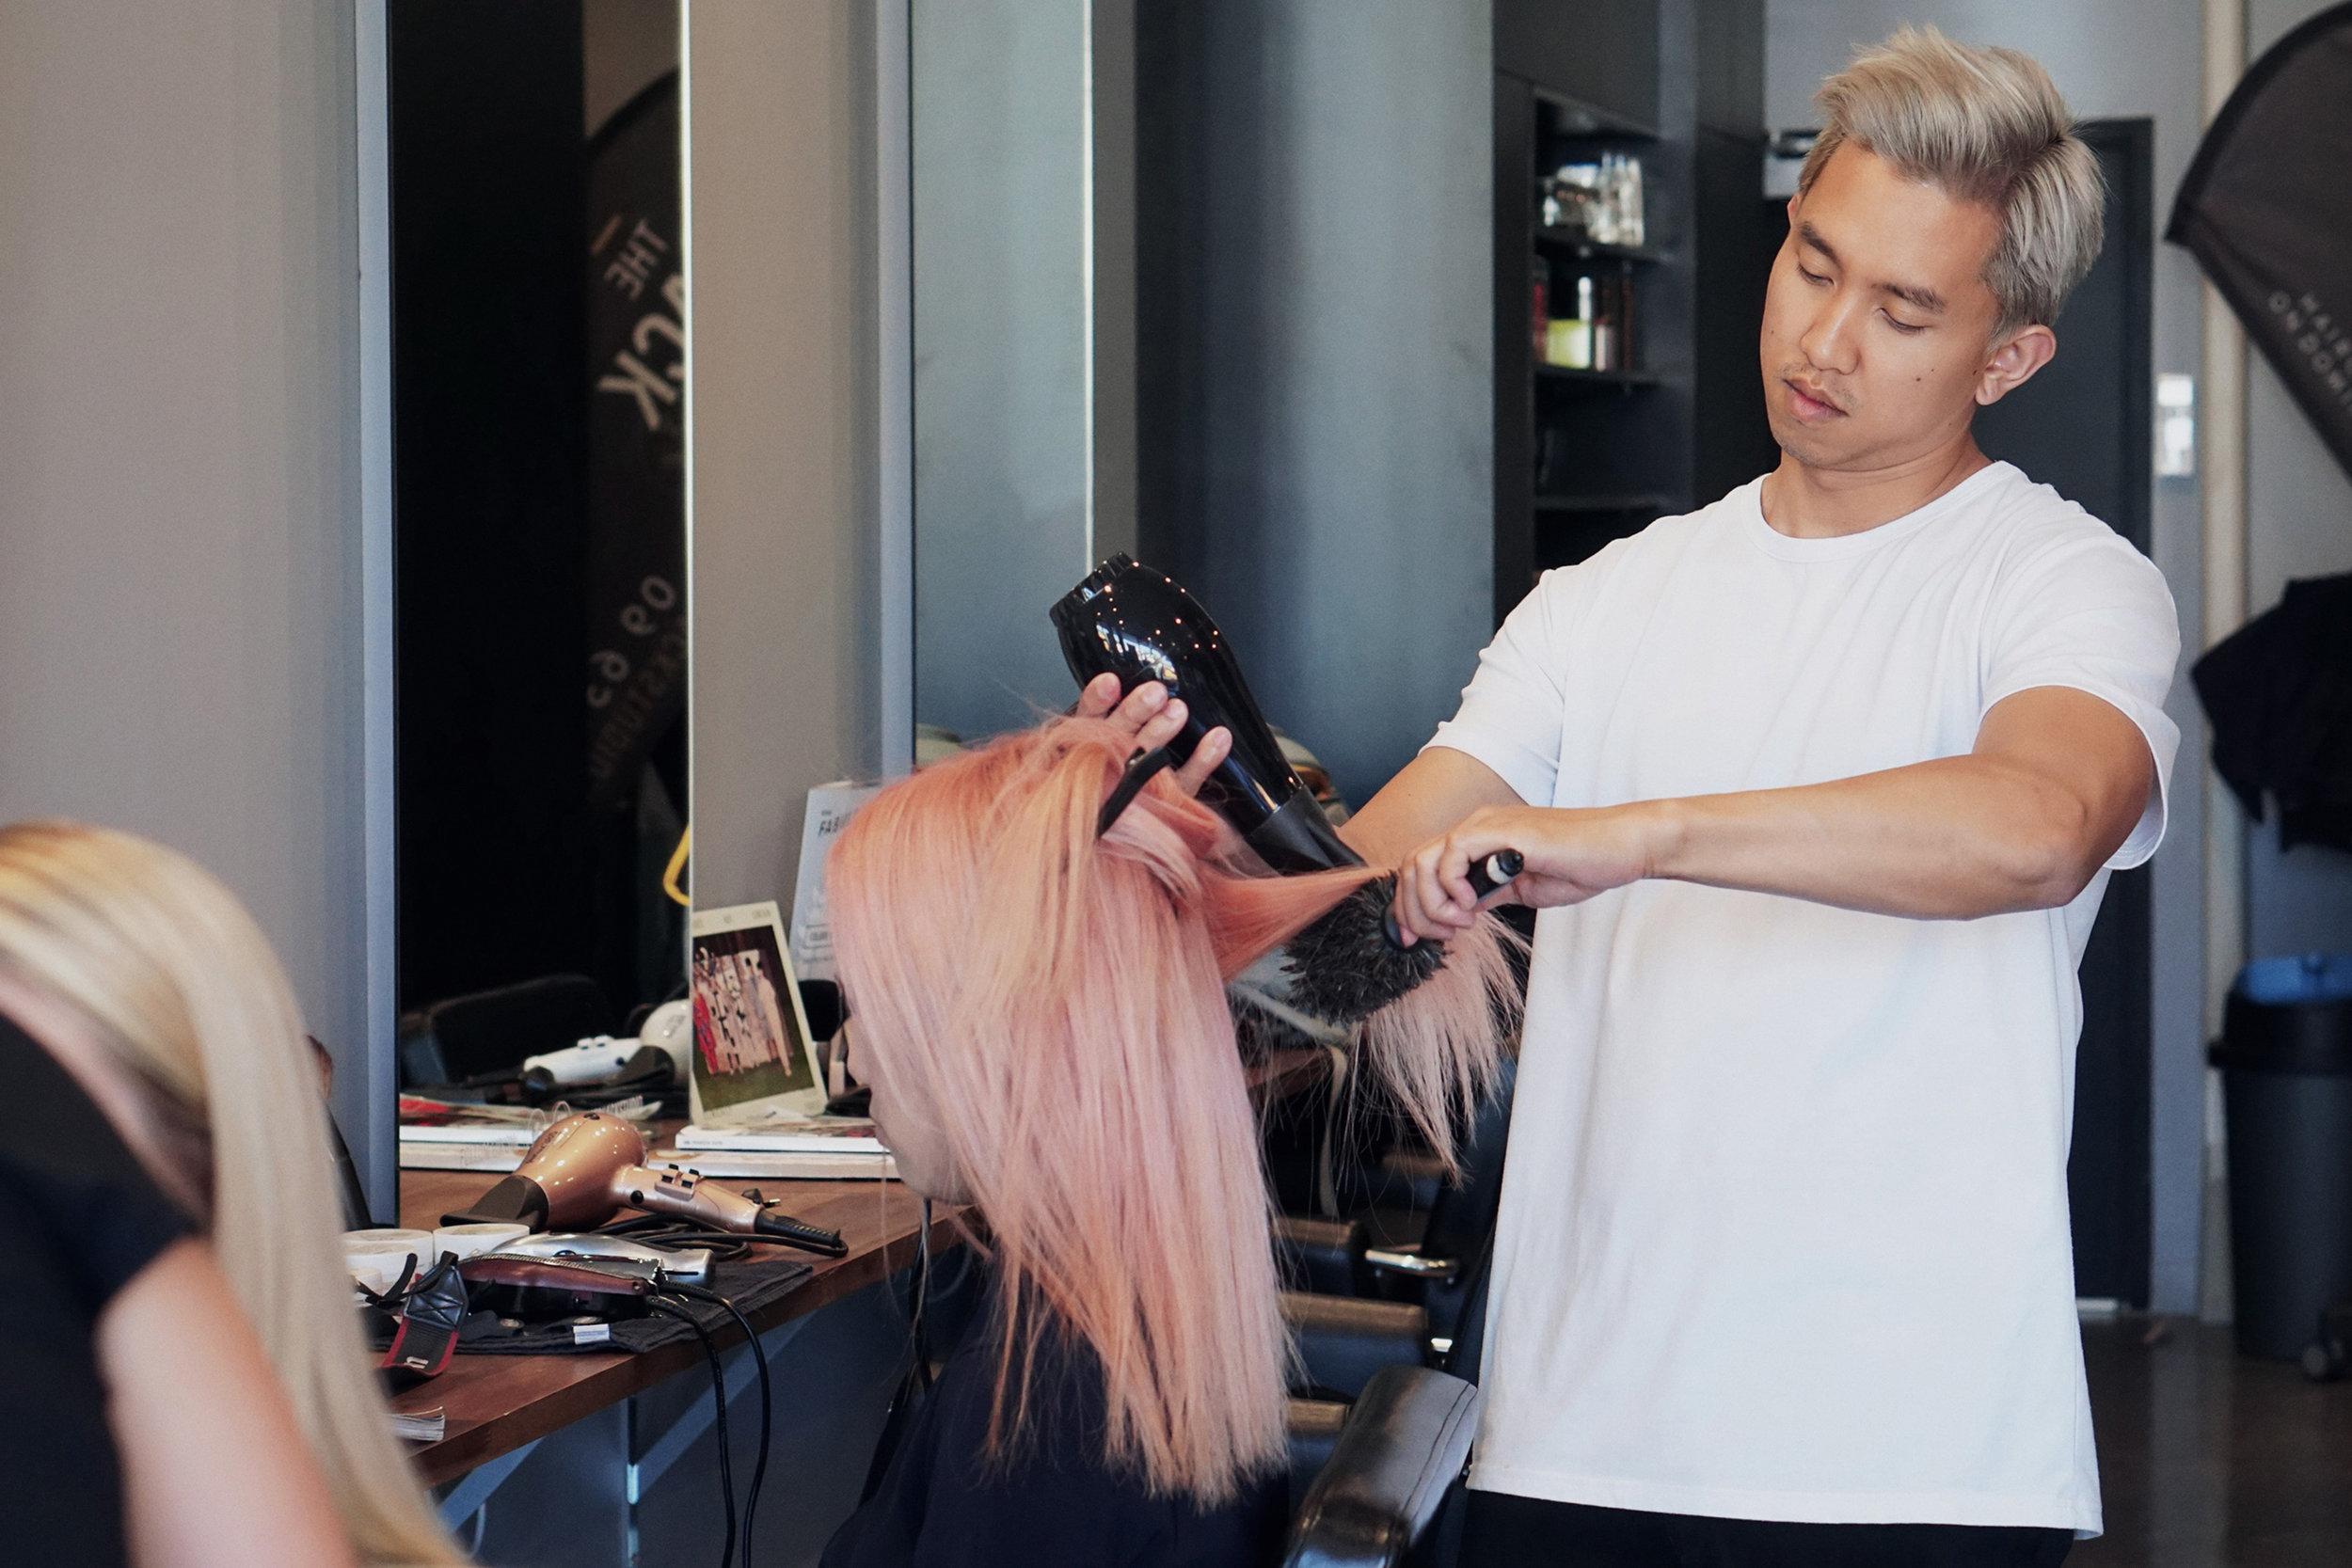 Vikkipedia-Hair-To-Stay-1-3x2.jpg